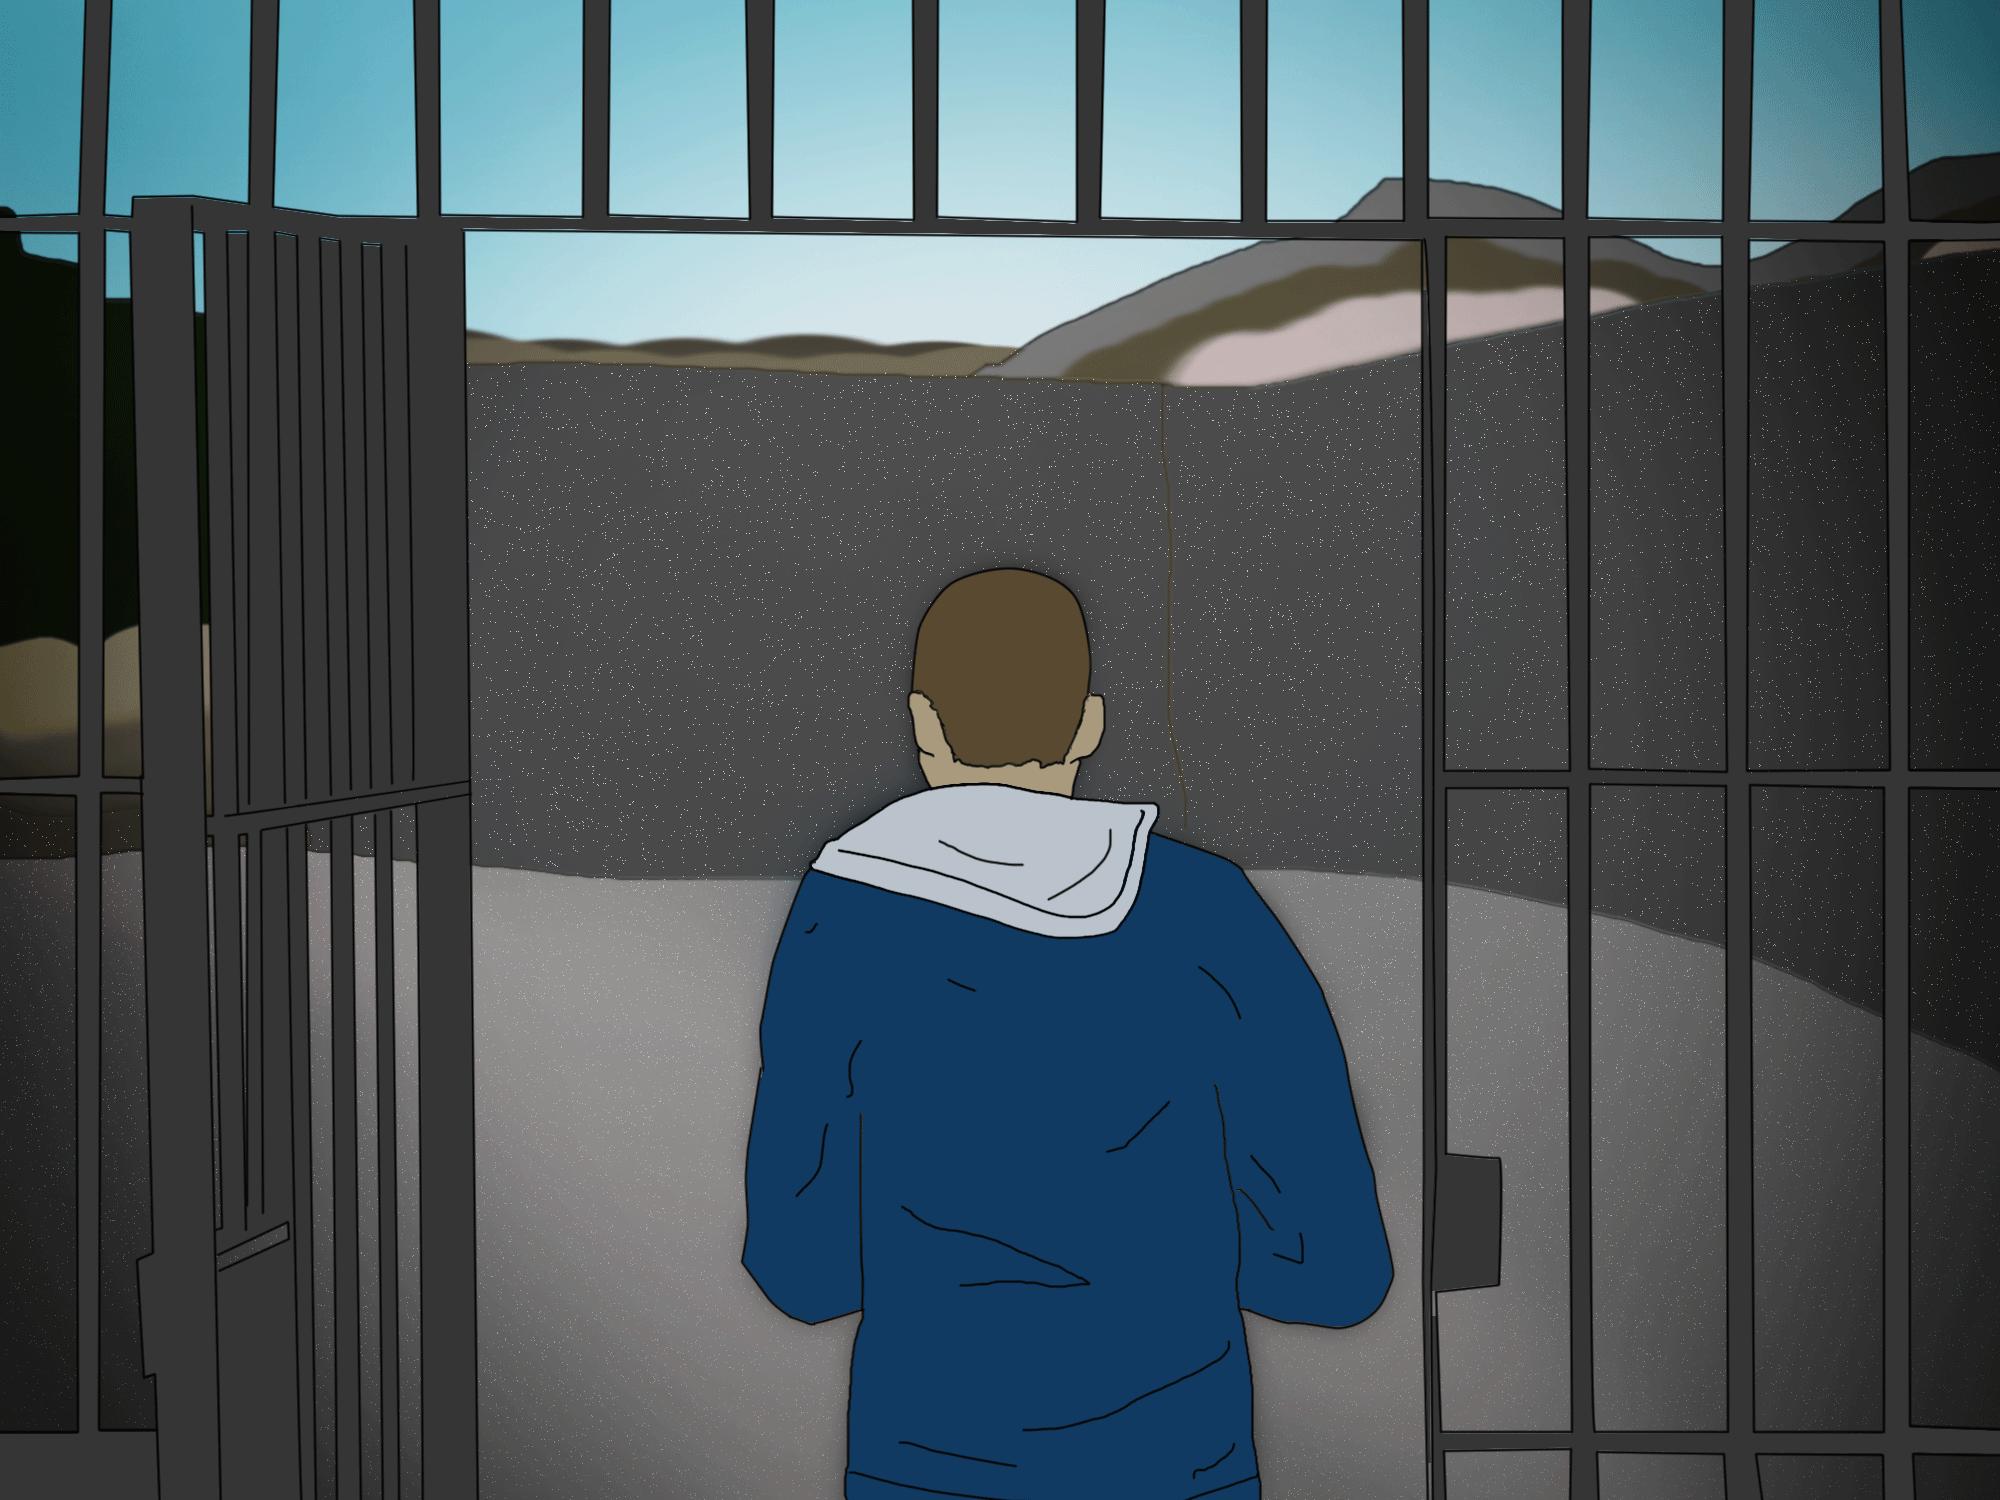 leaving-prison